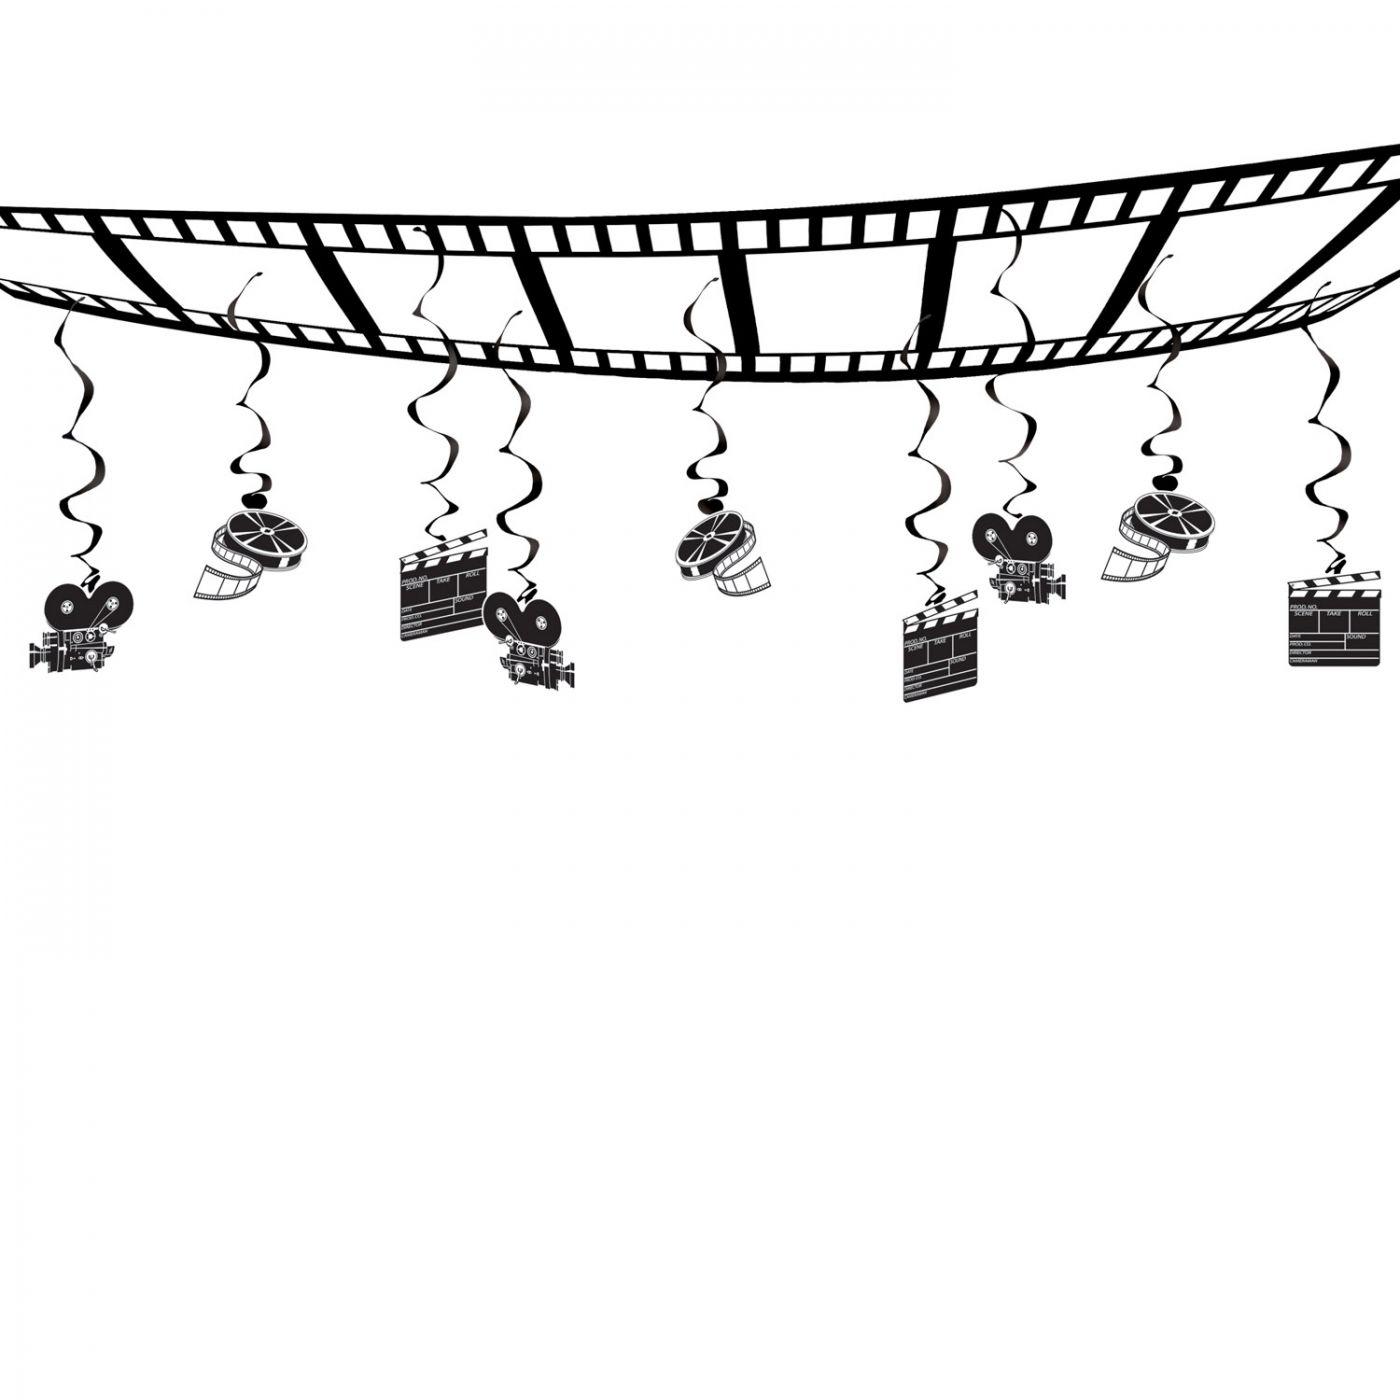 Movie Set Ceiling Decor (6) image